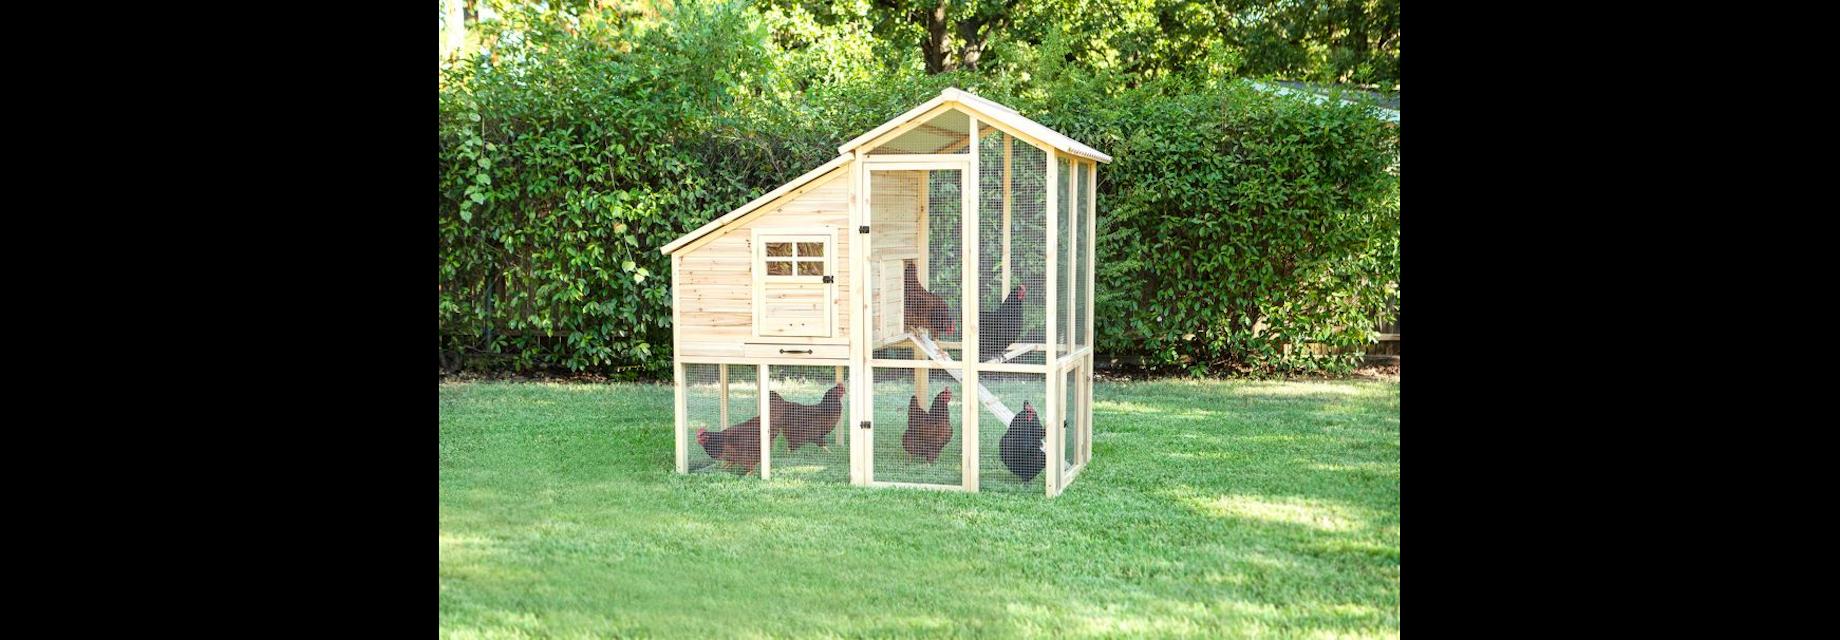 Superior Construction Chicken Coop